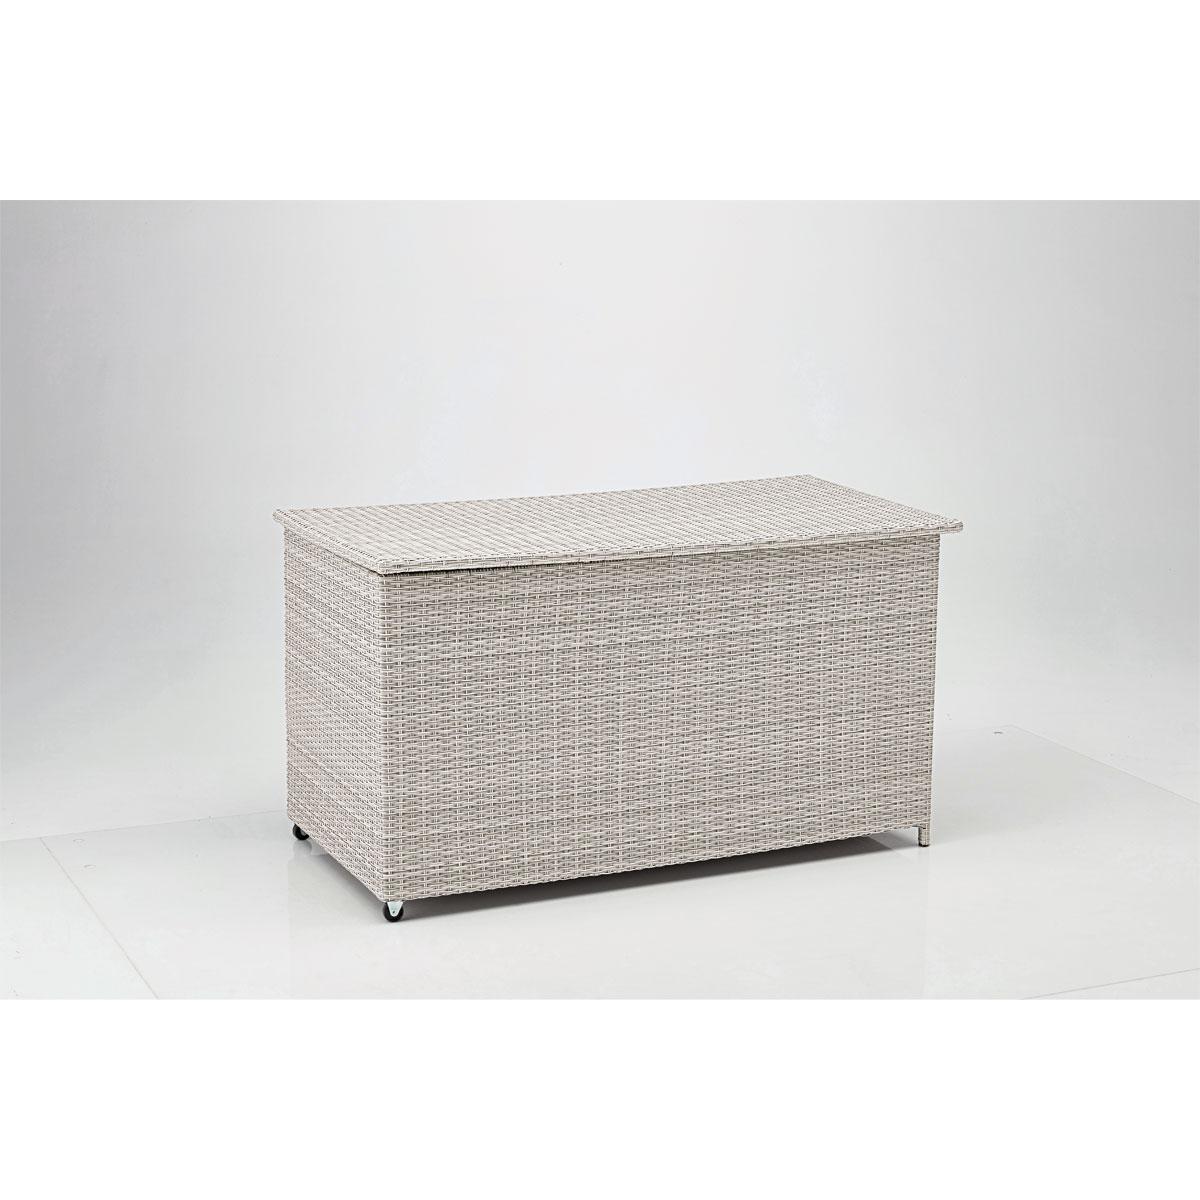 "Kissenbox ""Santorini"" 160x68x80 cm, naturfarben"